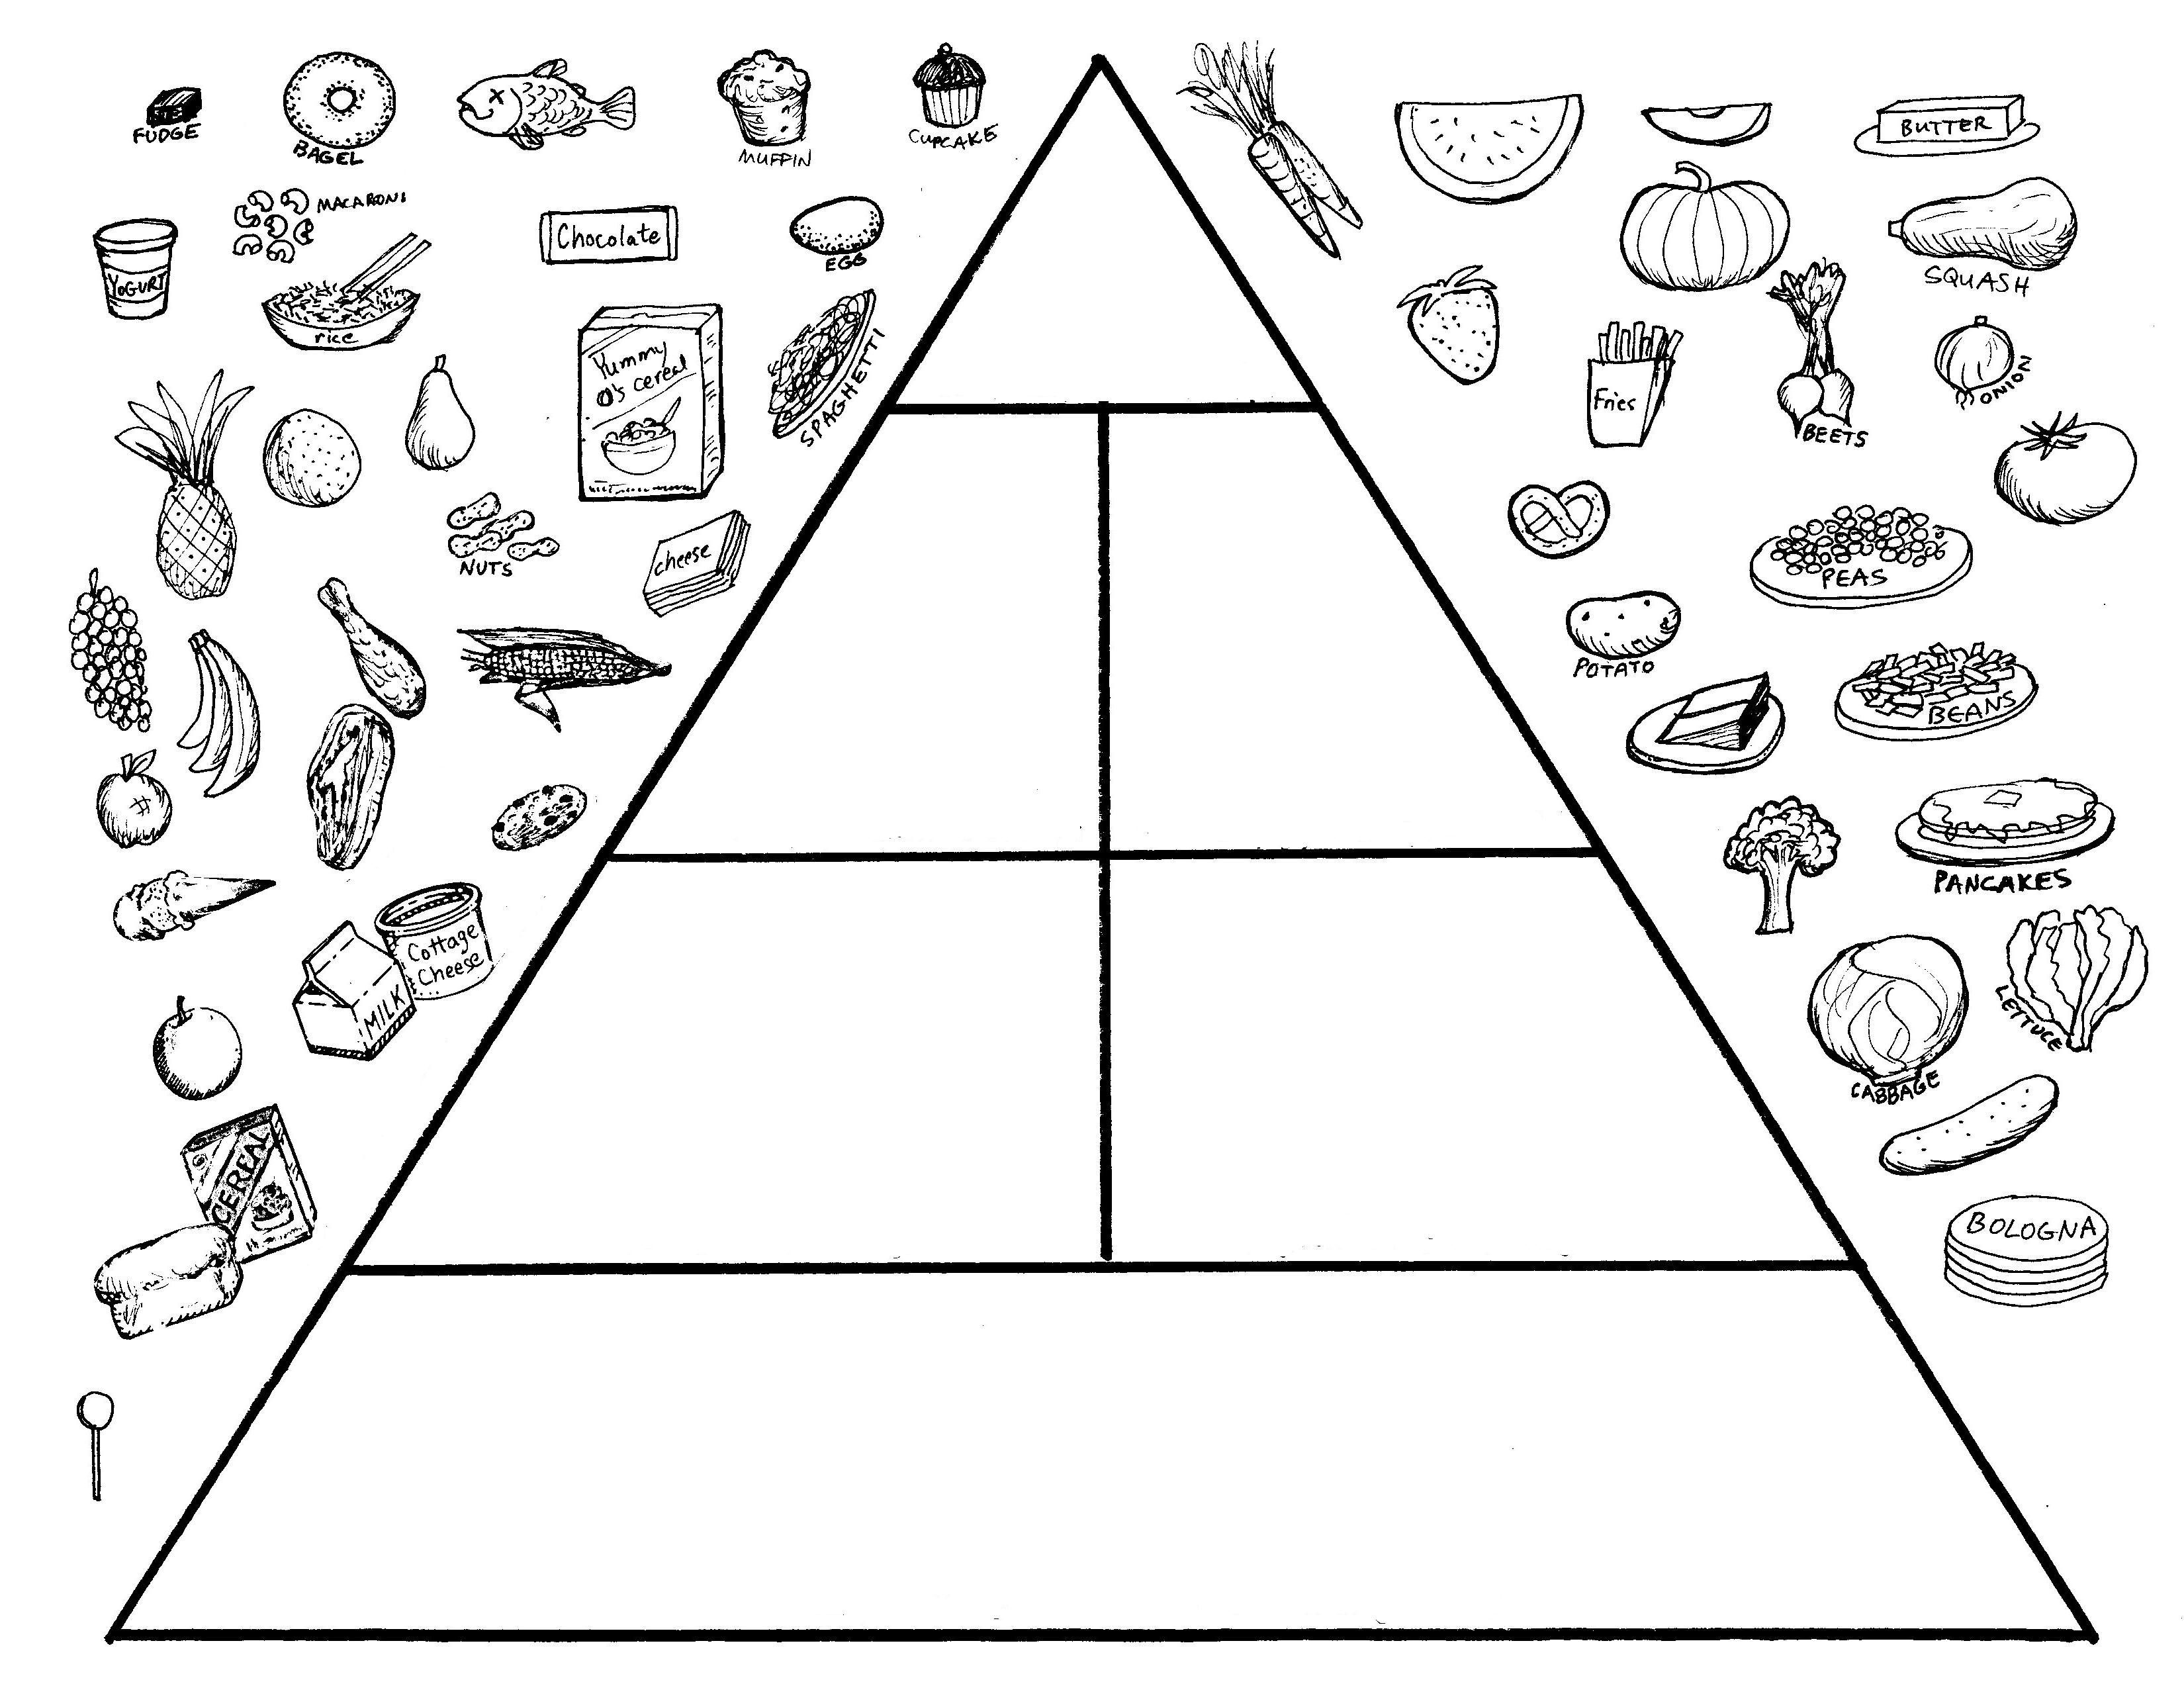 Printable Food Pyramid Activities   Food Pyramid Coloring Pages - Free Printable Food Pyramid